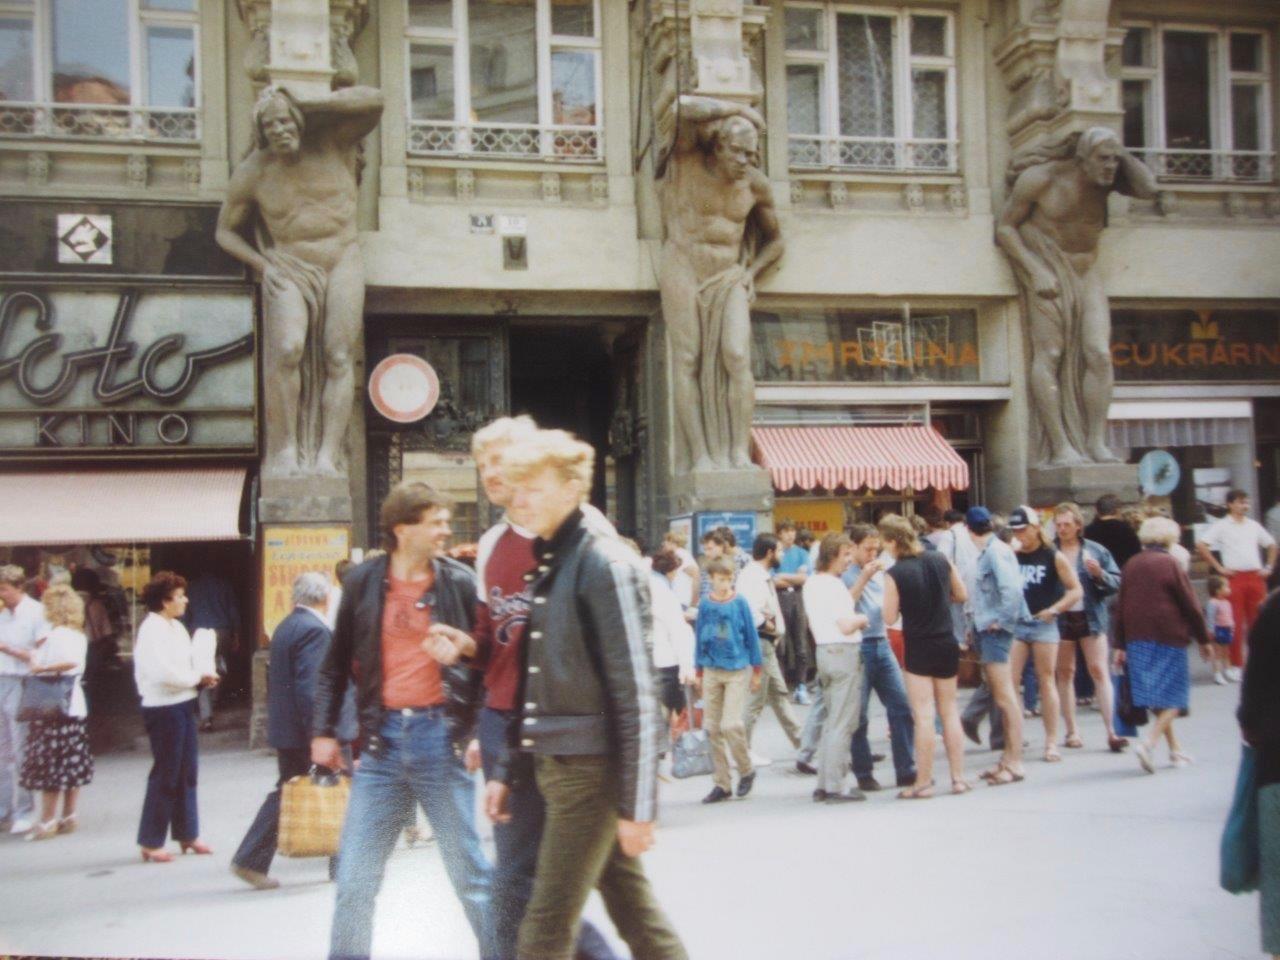 Street scene from central Brno, Czech Republic, in August 1988.